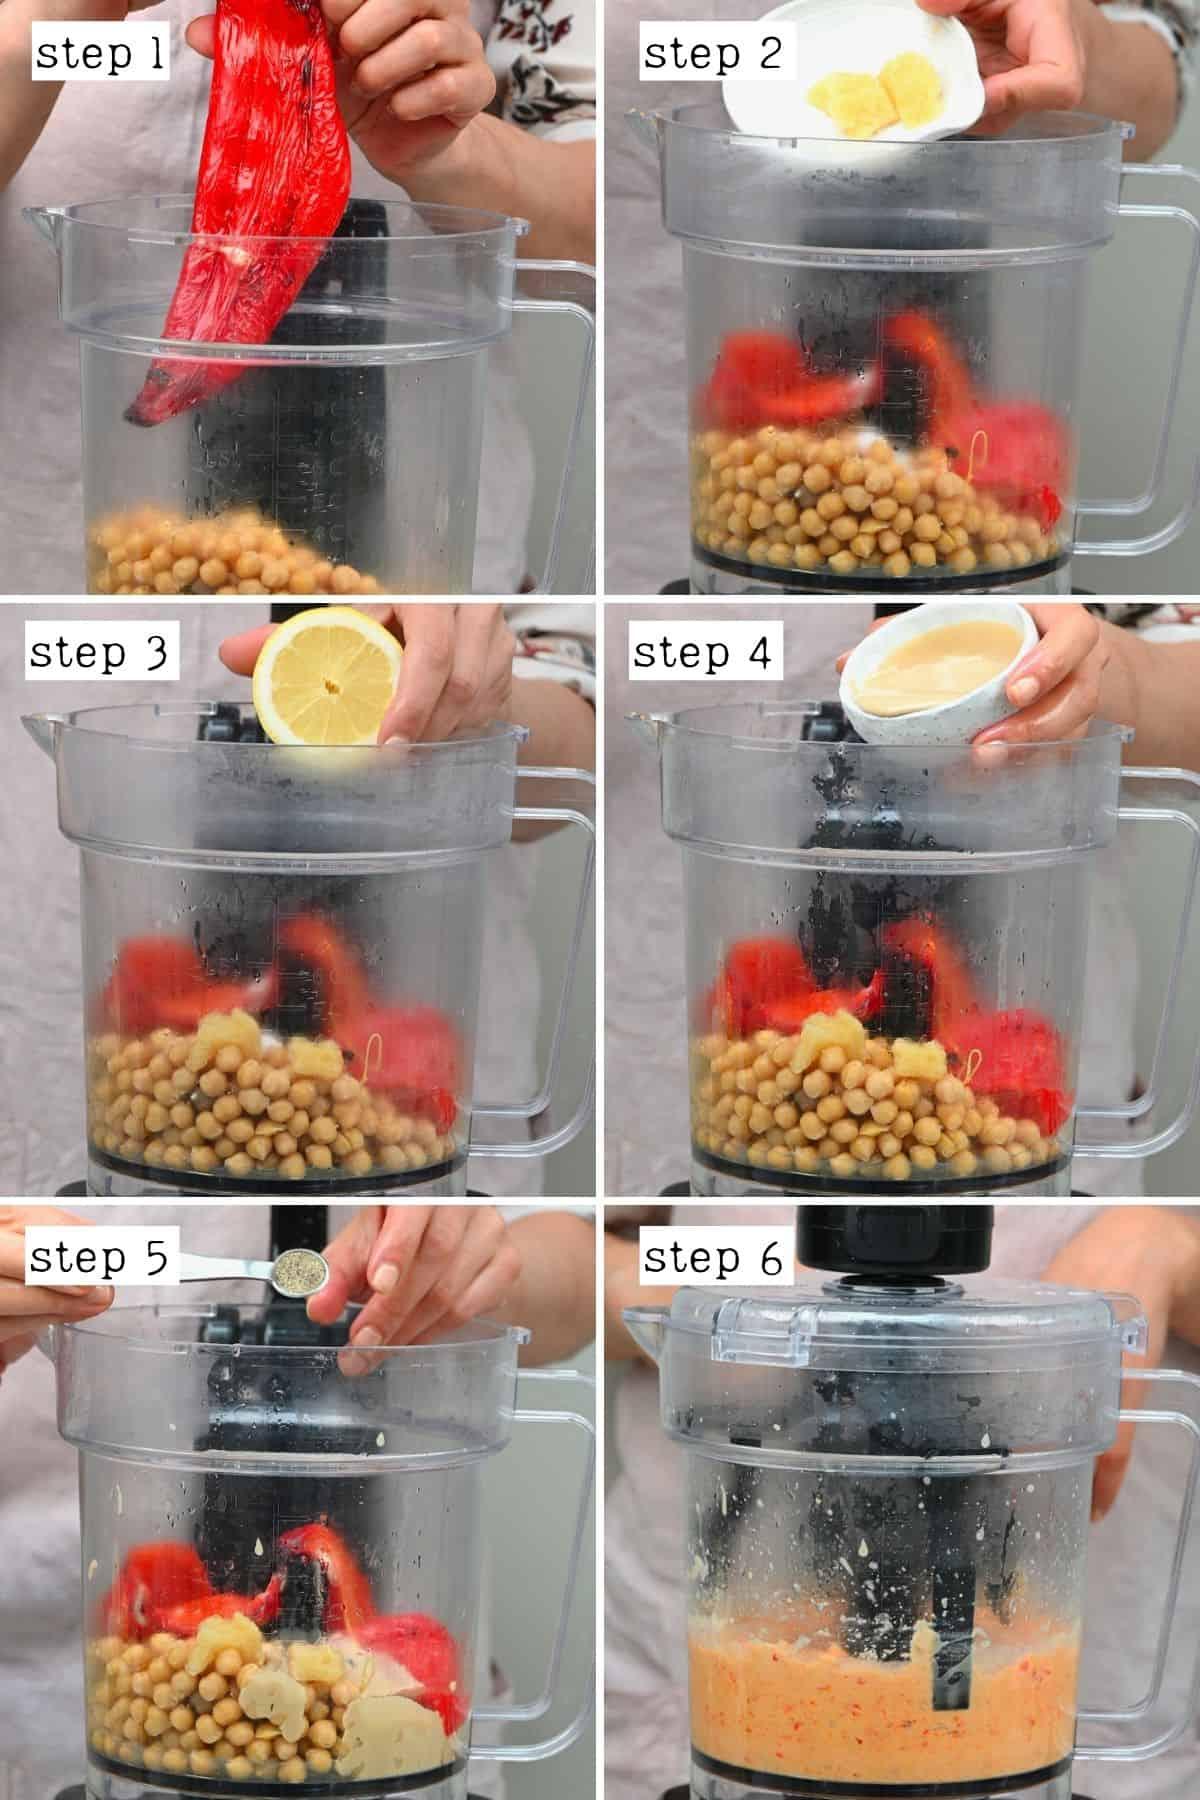 Steps for preparing red pepper hummus